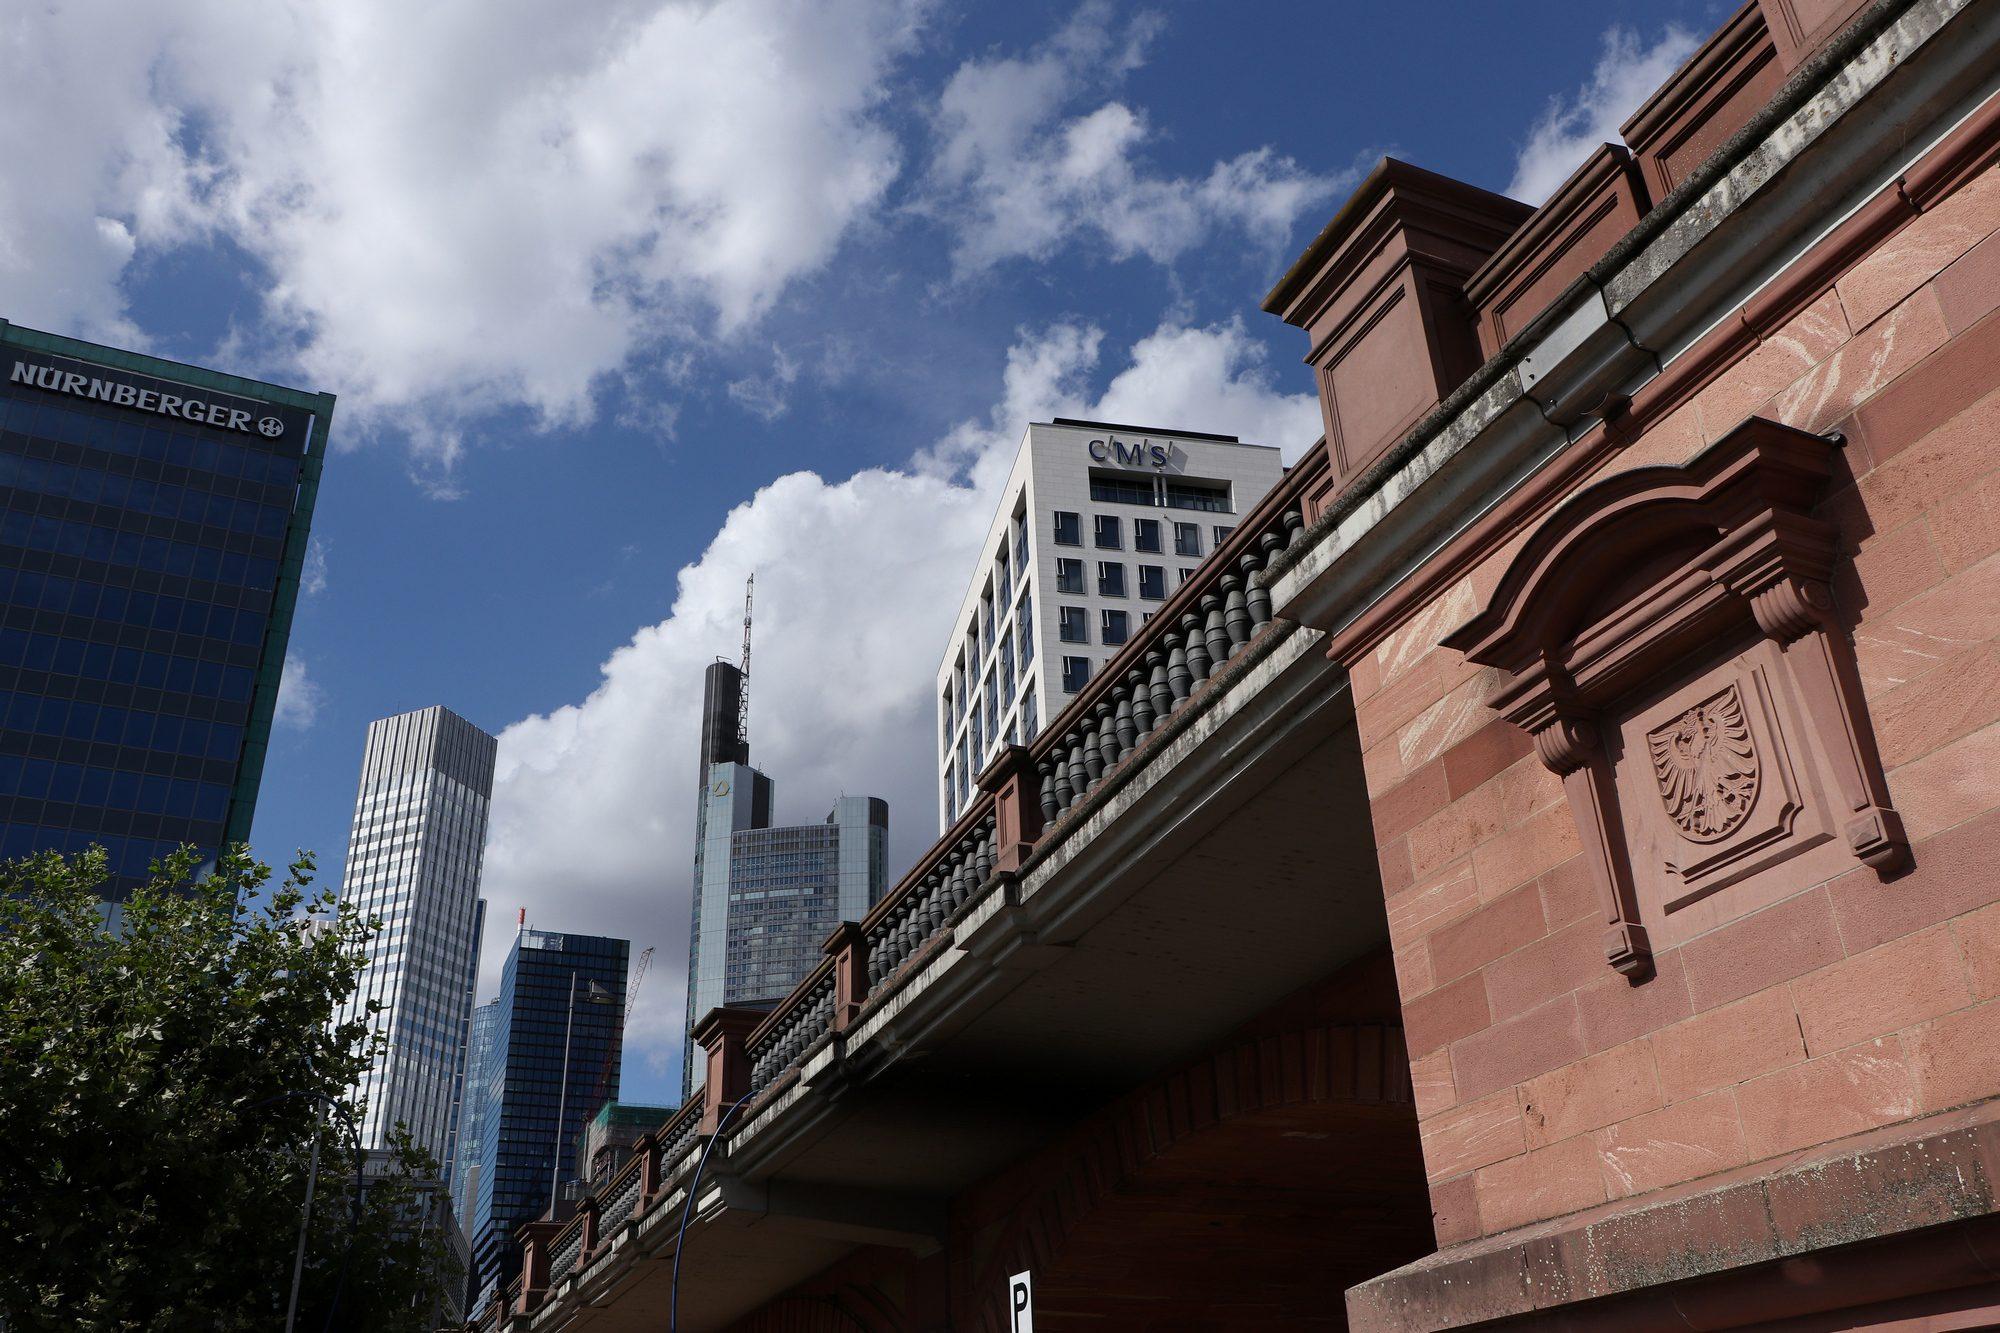 Brücke vor Skyline in Frankfurt am Main